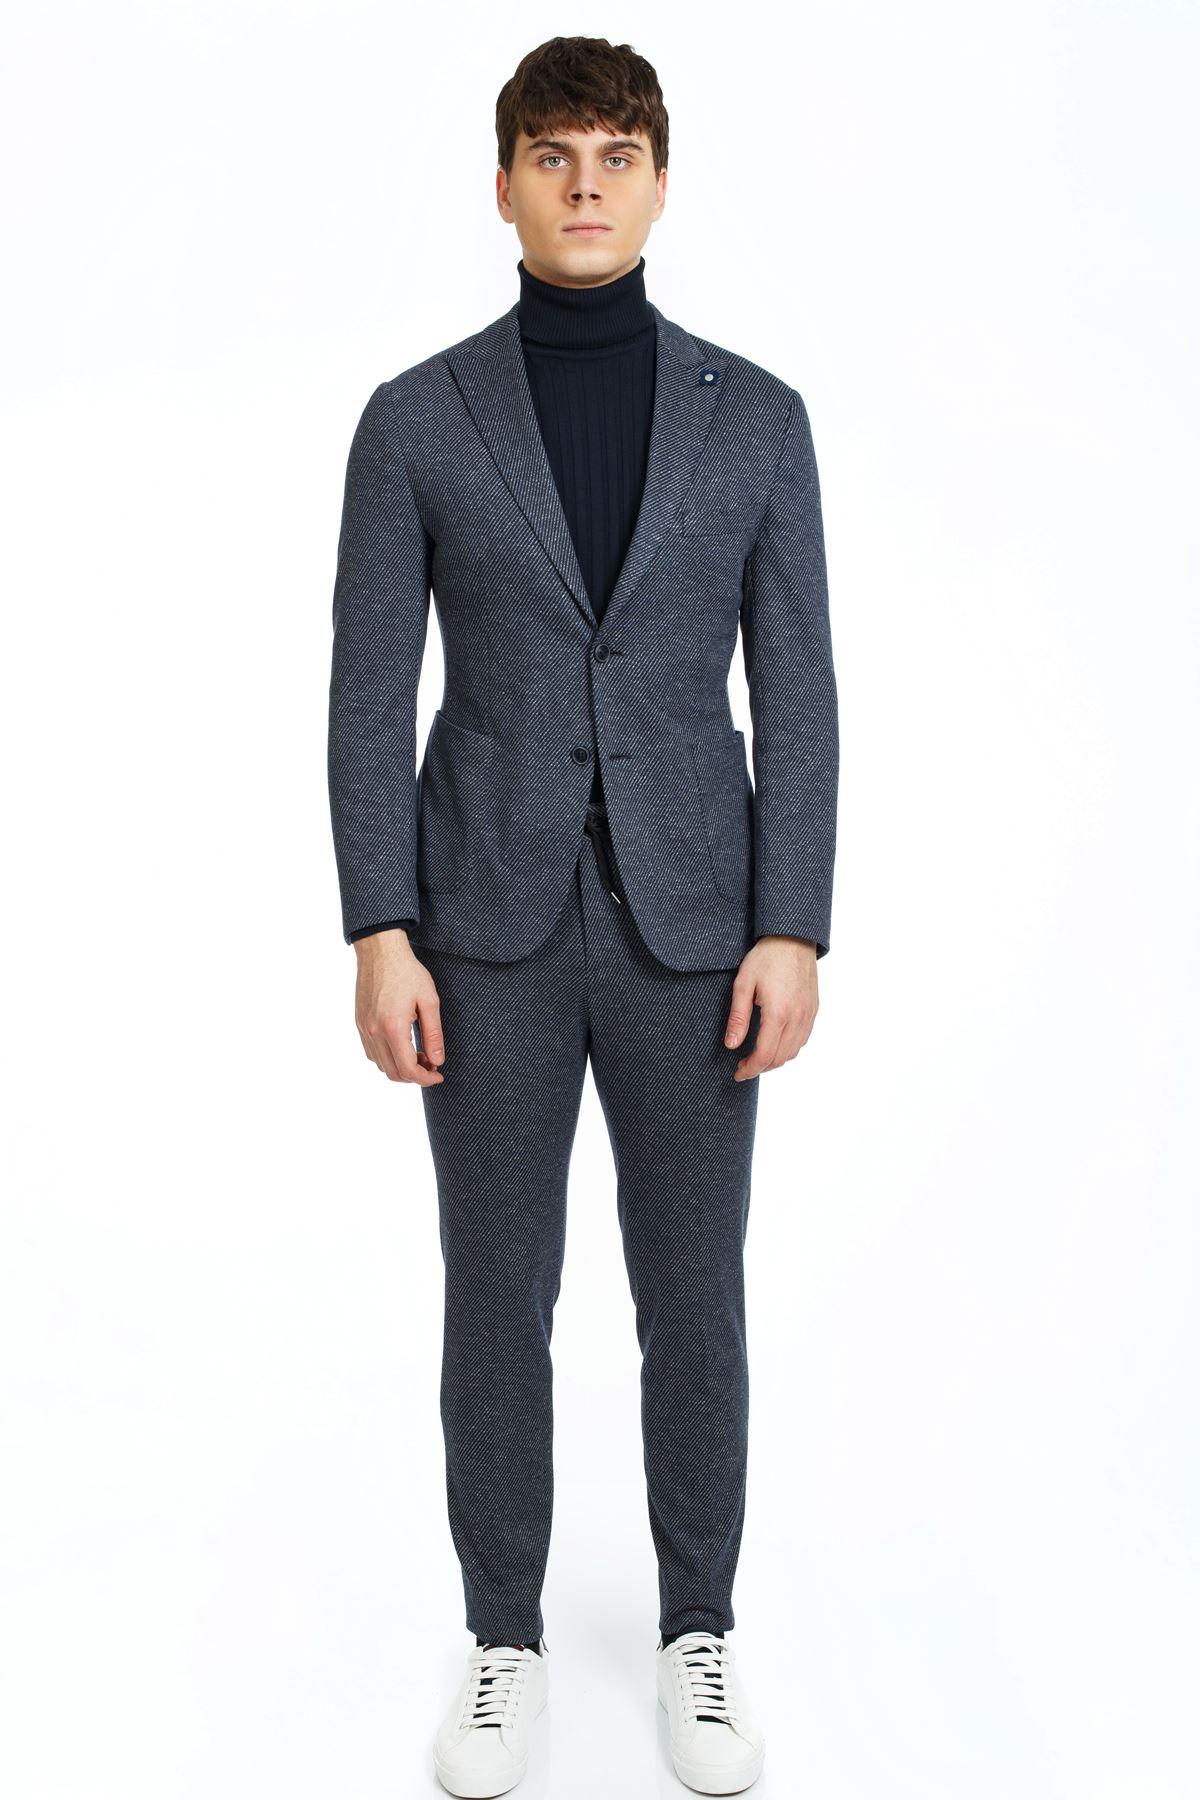 Lacivert Diagonel Desenli Süper Slim Takım Elbise